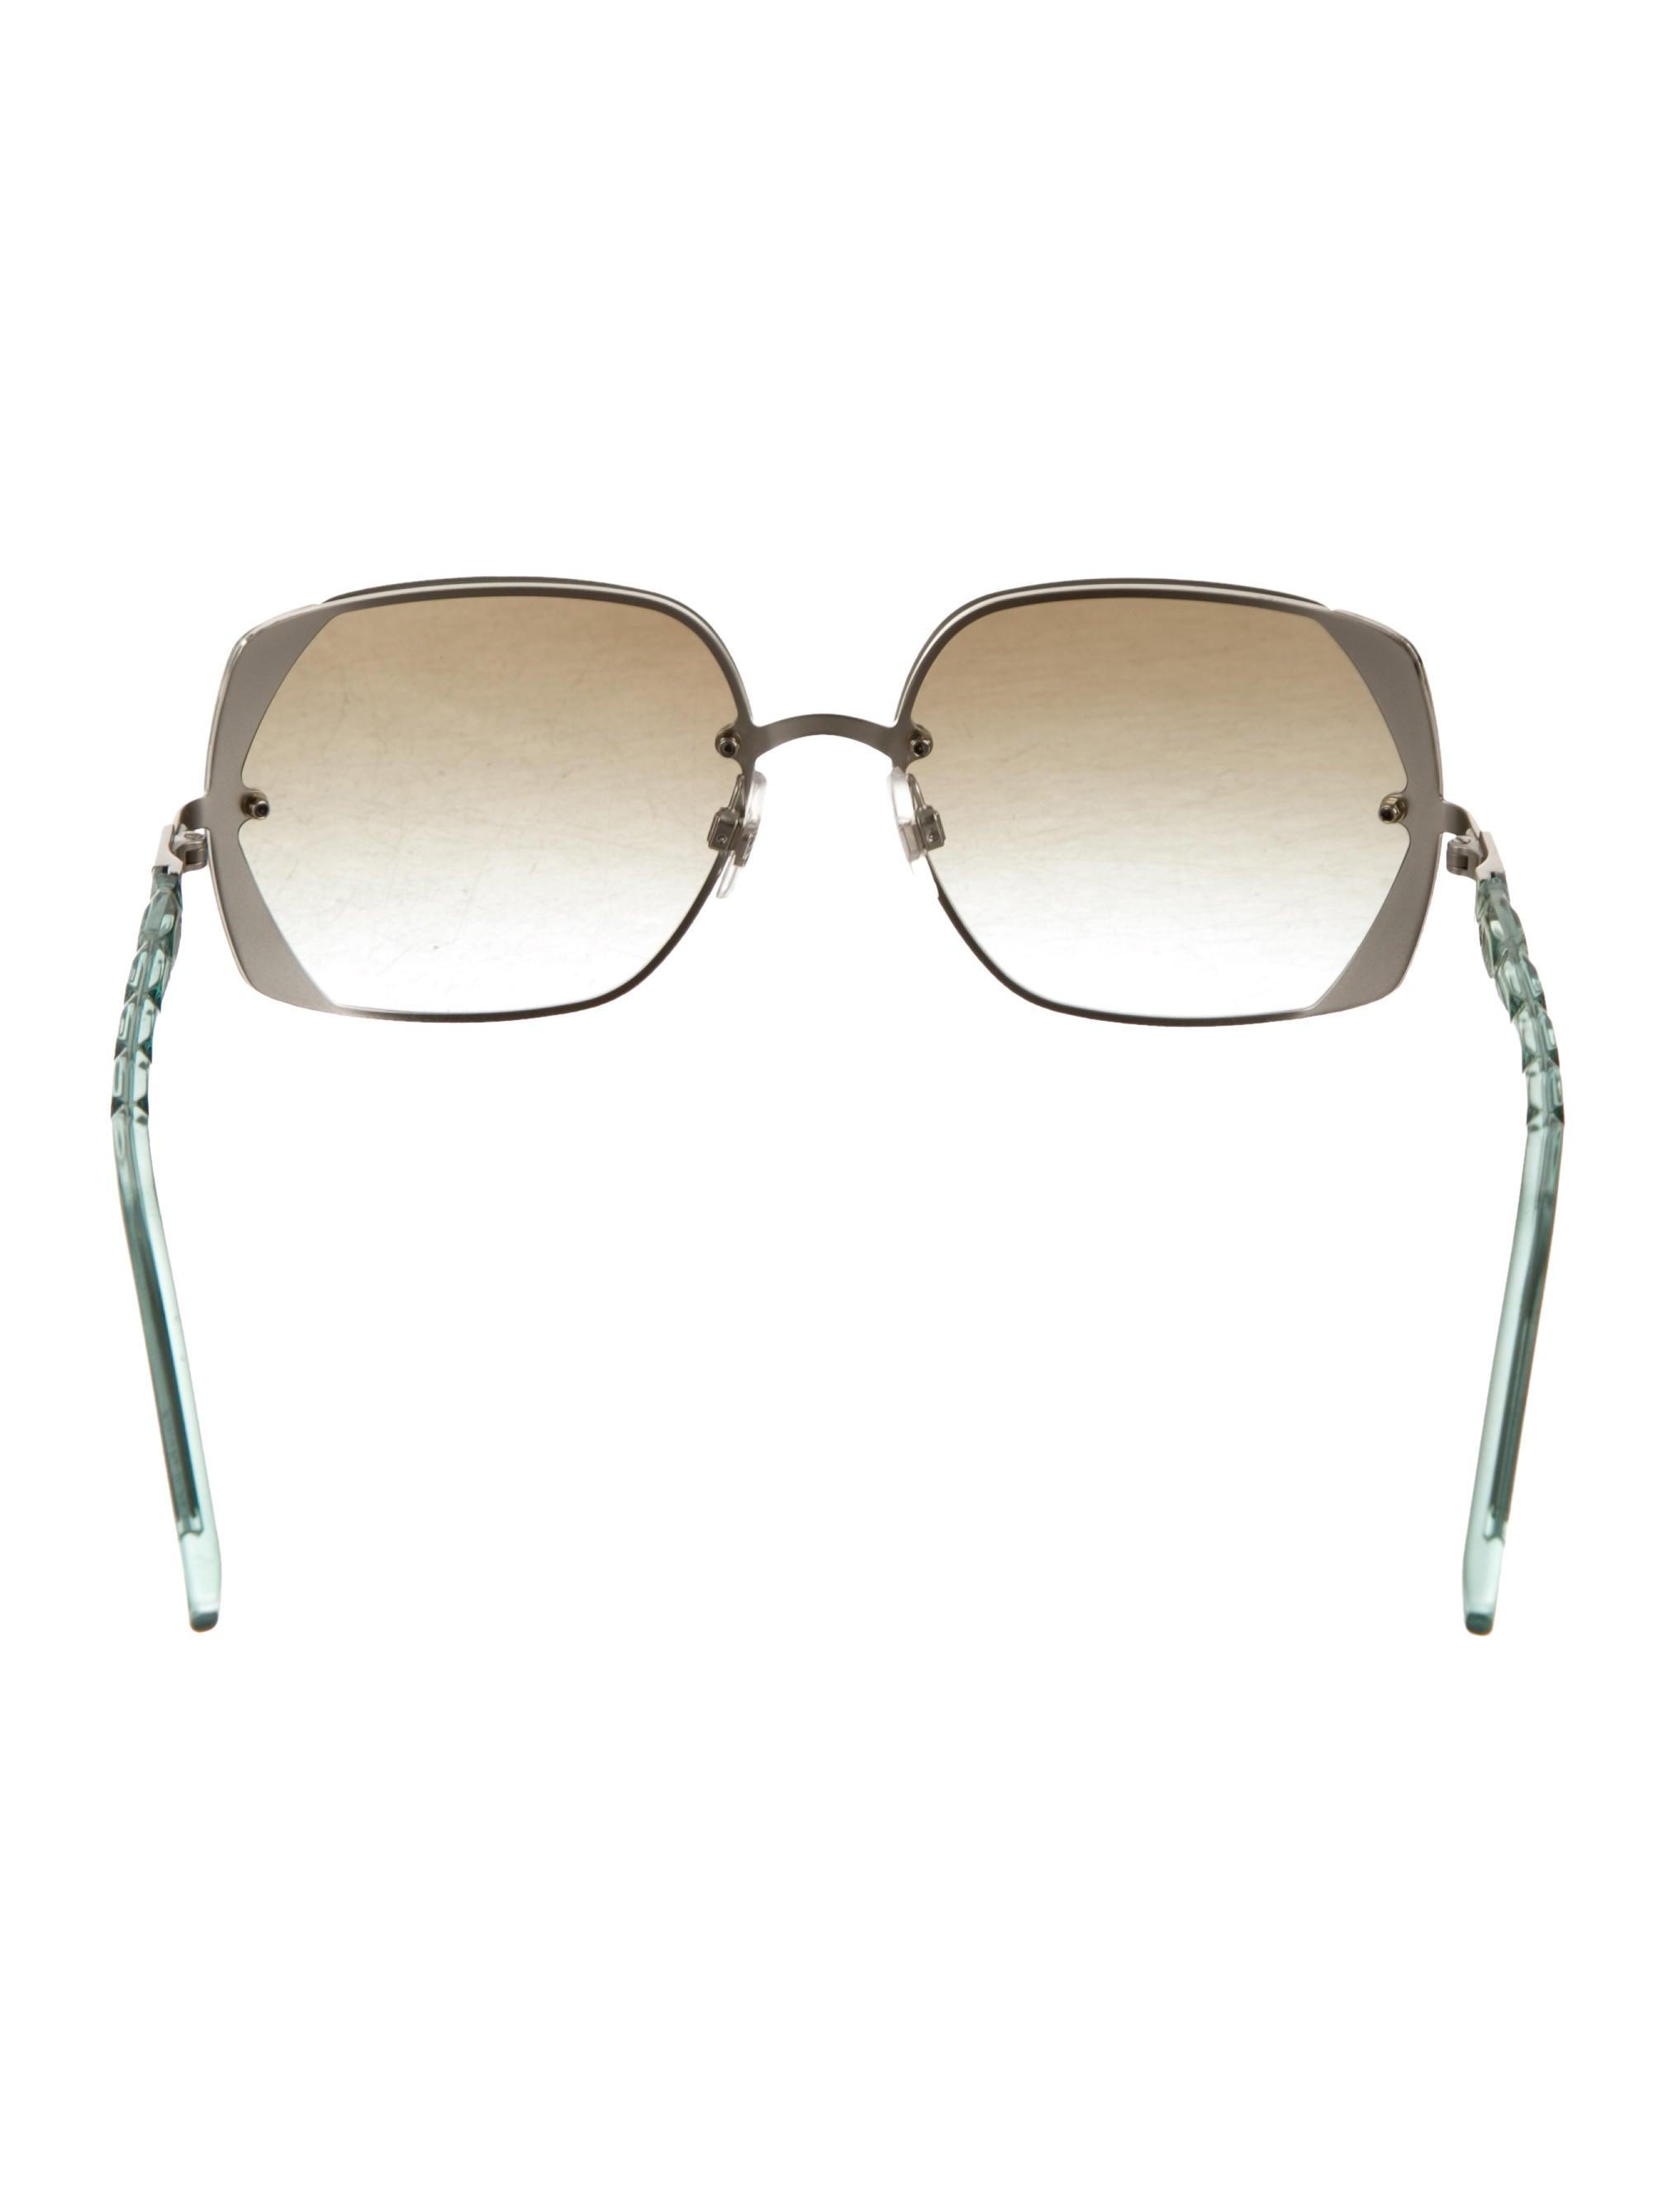 Frameless Sunglasses Lelong : Swarovski Cha Cha Frameless Sunglasses - Accessories ...